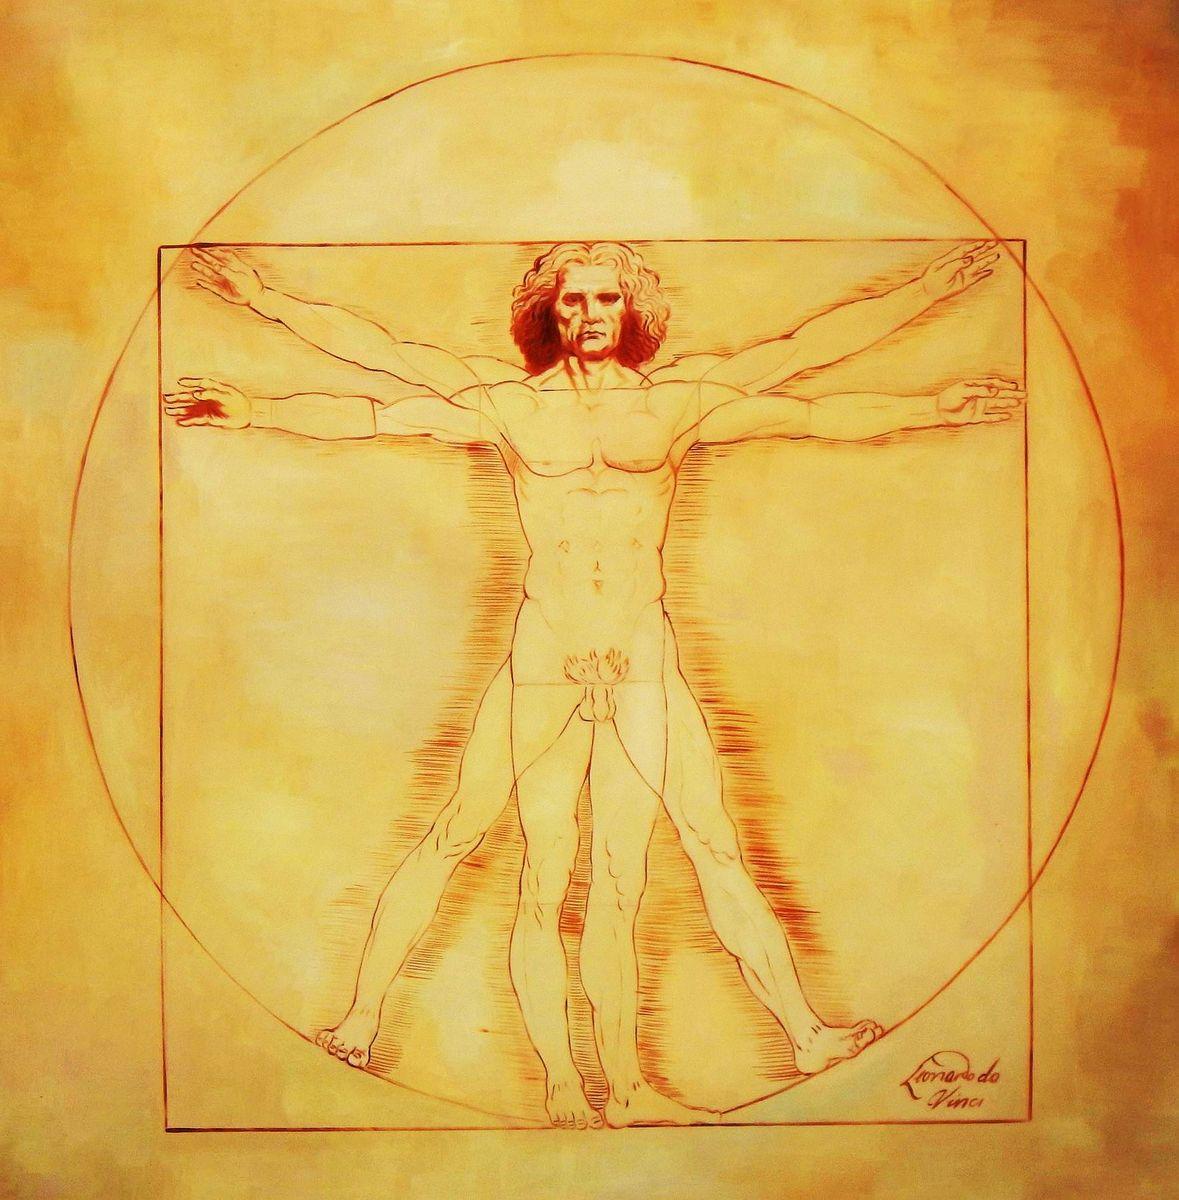 Leonardo da Vinci - Proportionsstudie m94085 120x120cm handgemaltes Ölgemälde